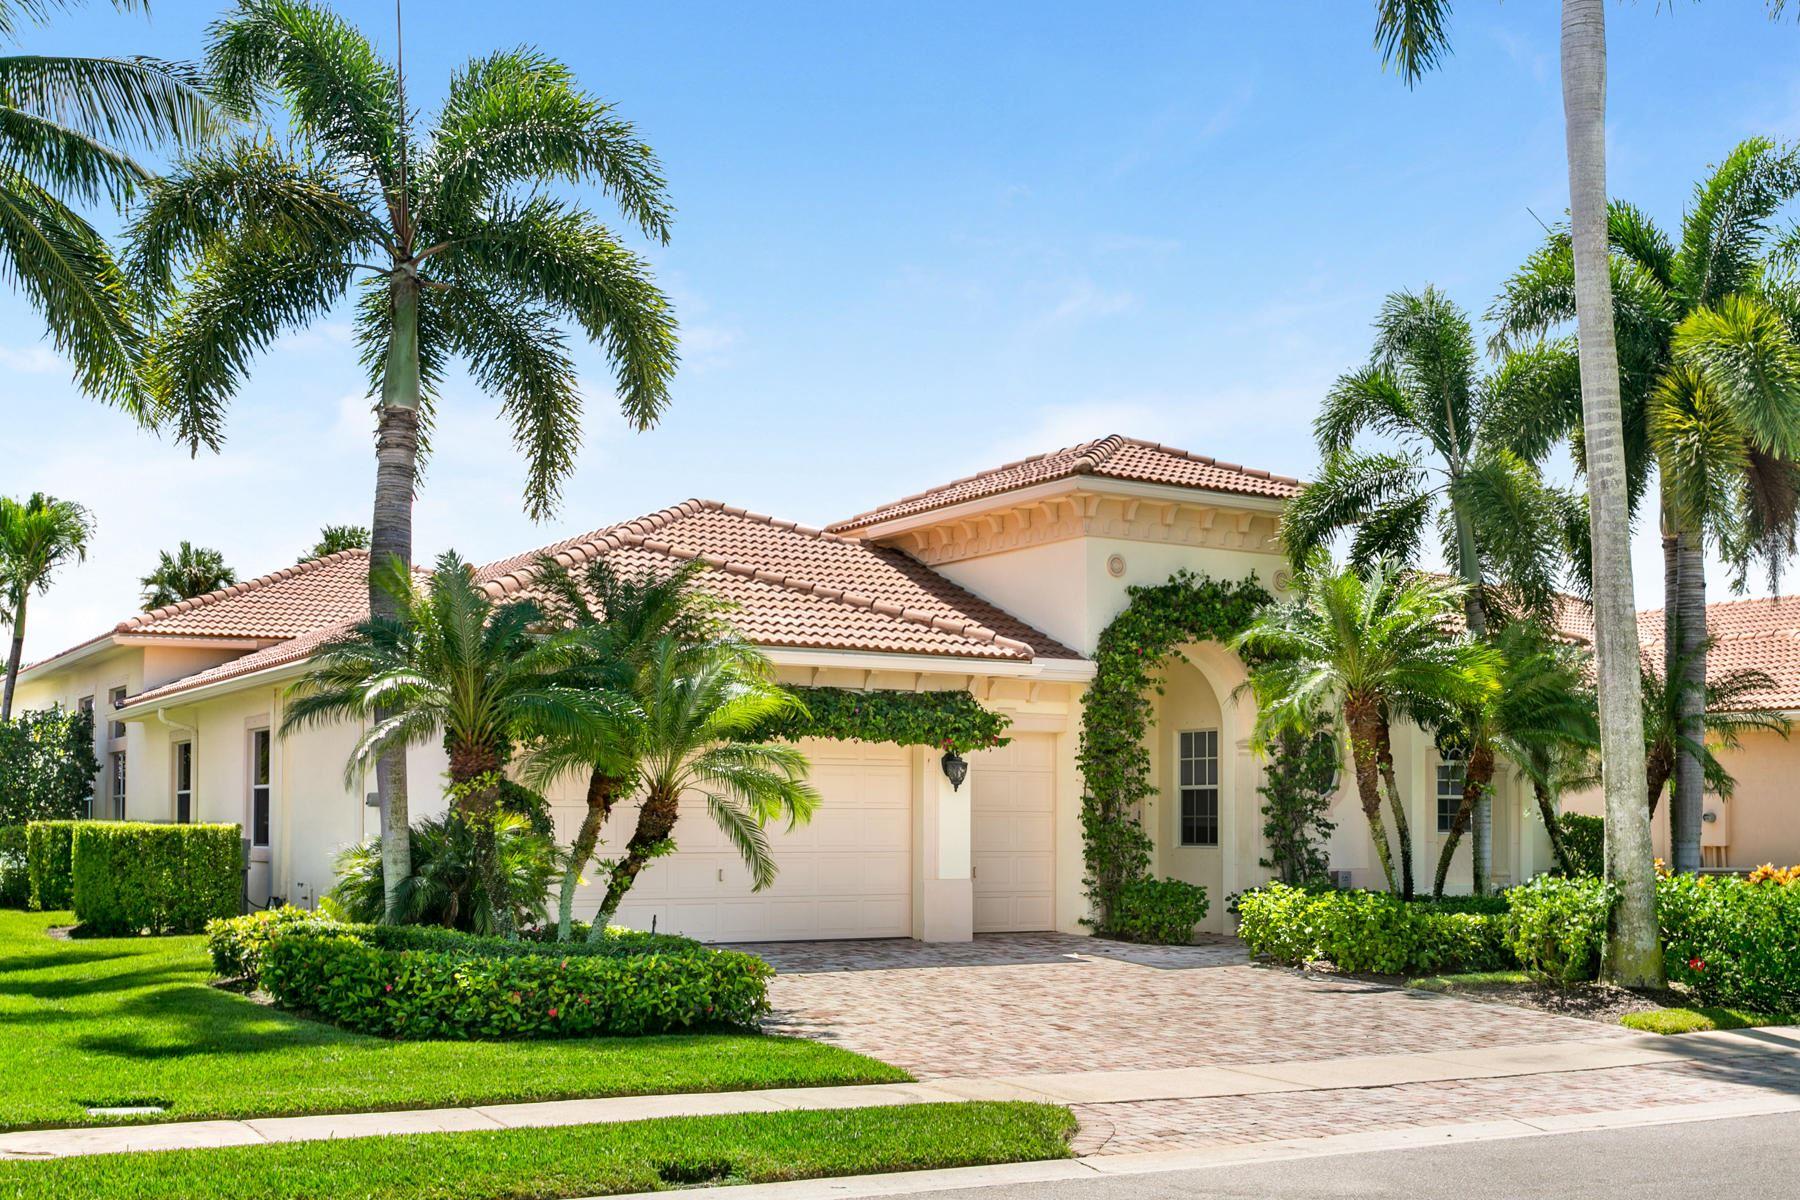 Photo of 530 Les Jardin Drive, Palm Beach Gardens, FL 33410 (MLS # RX-10687748)